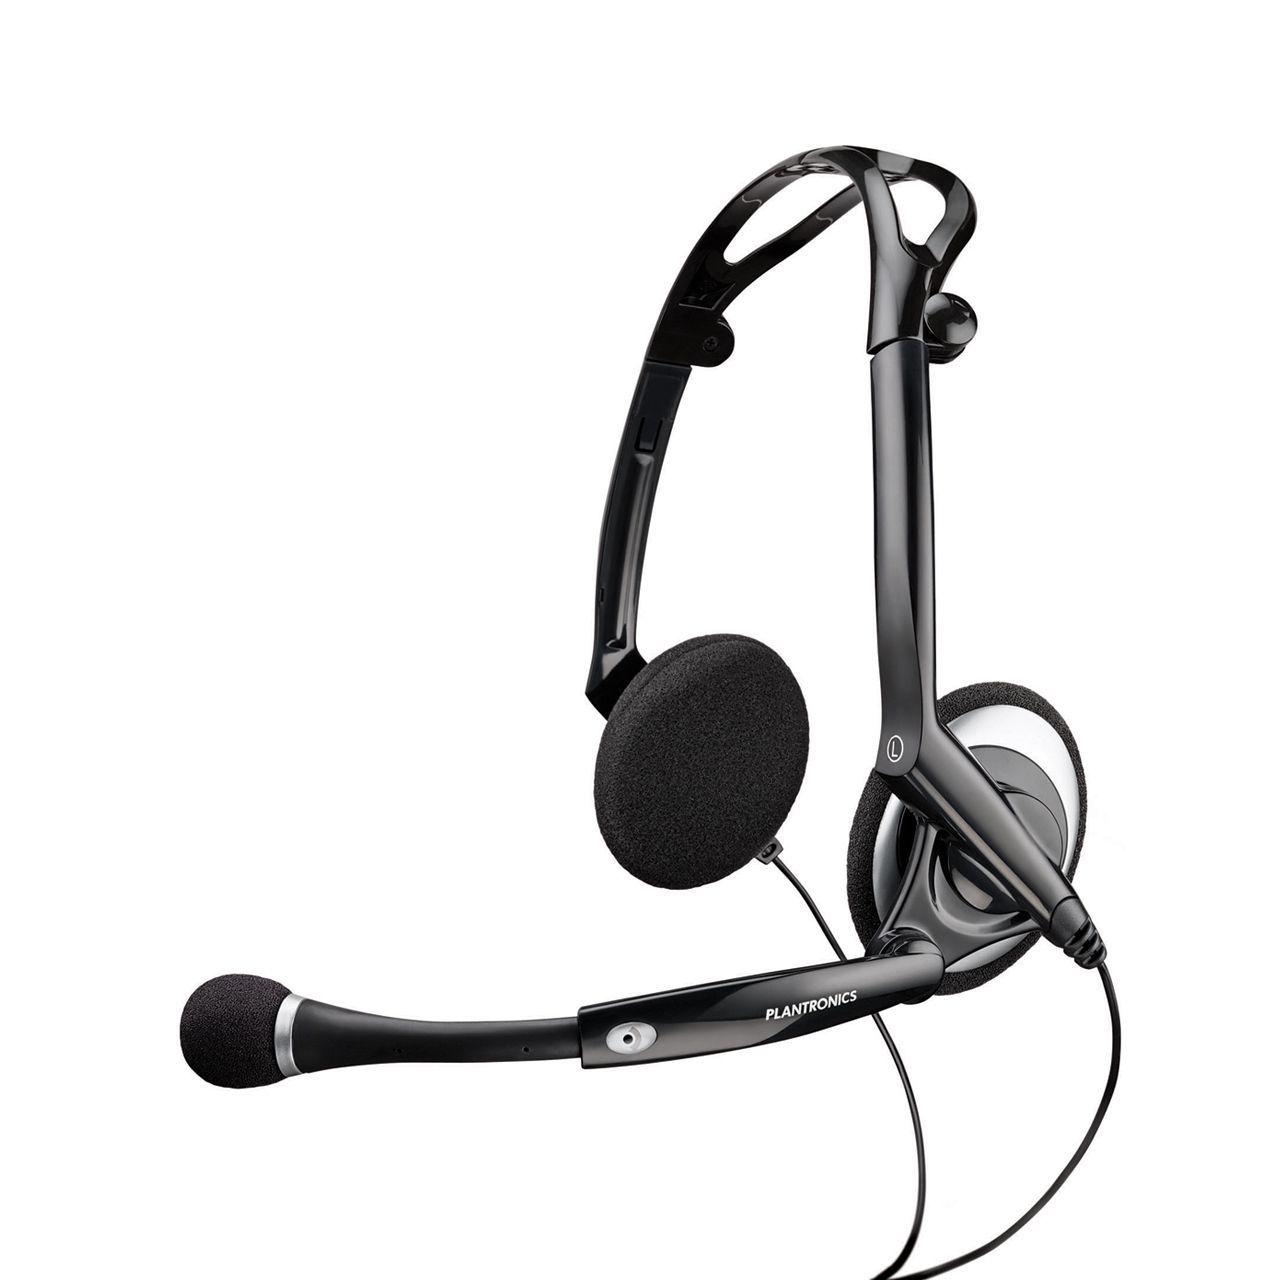 Opvouwbare headsets van Plantronics